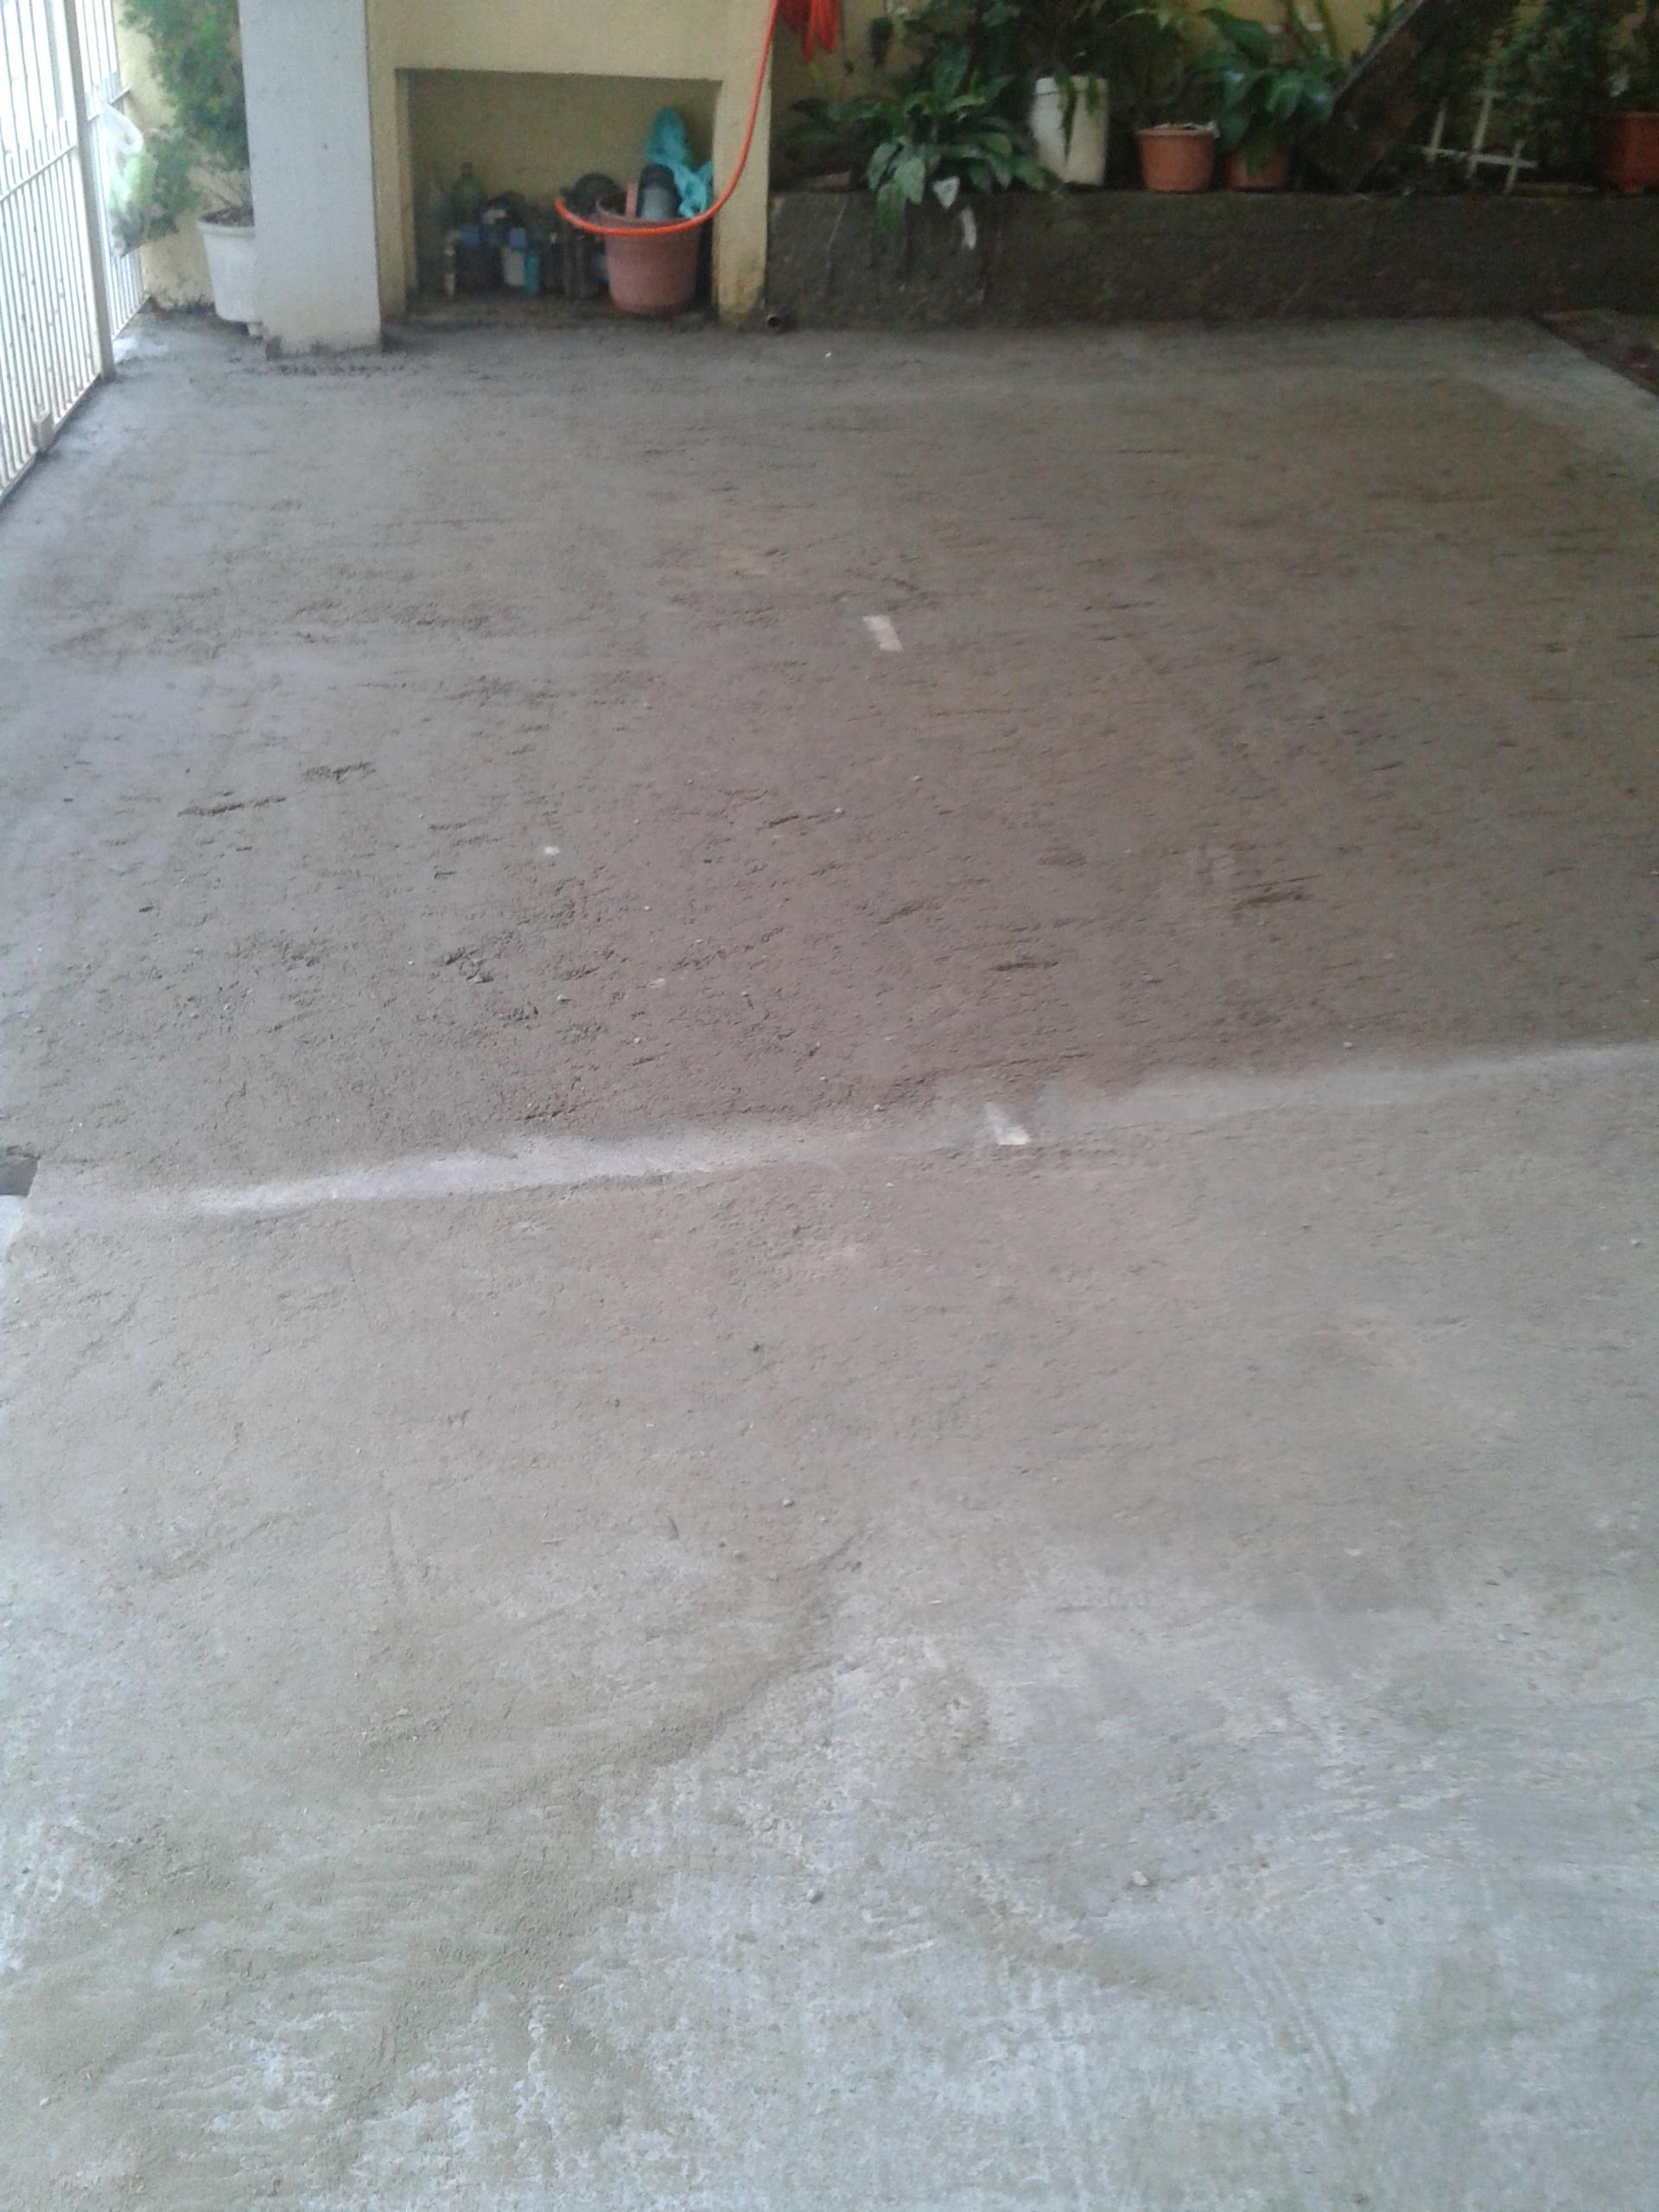 Reforma de piso remo o piso concreto contra piso - Reformas de piso ...